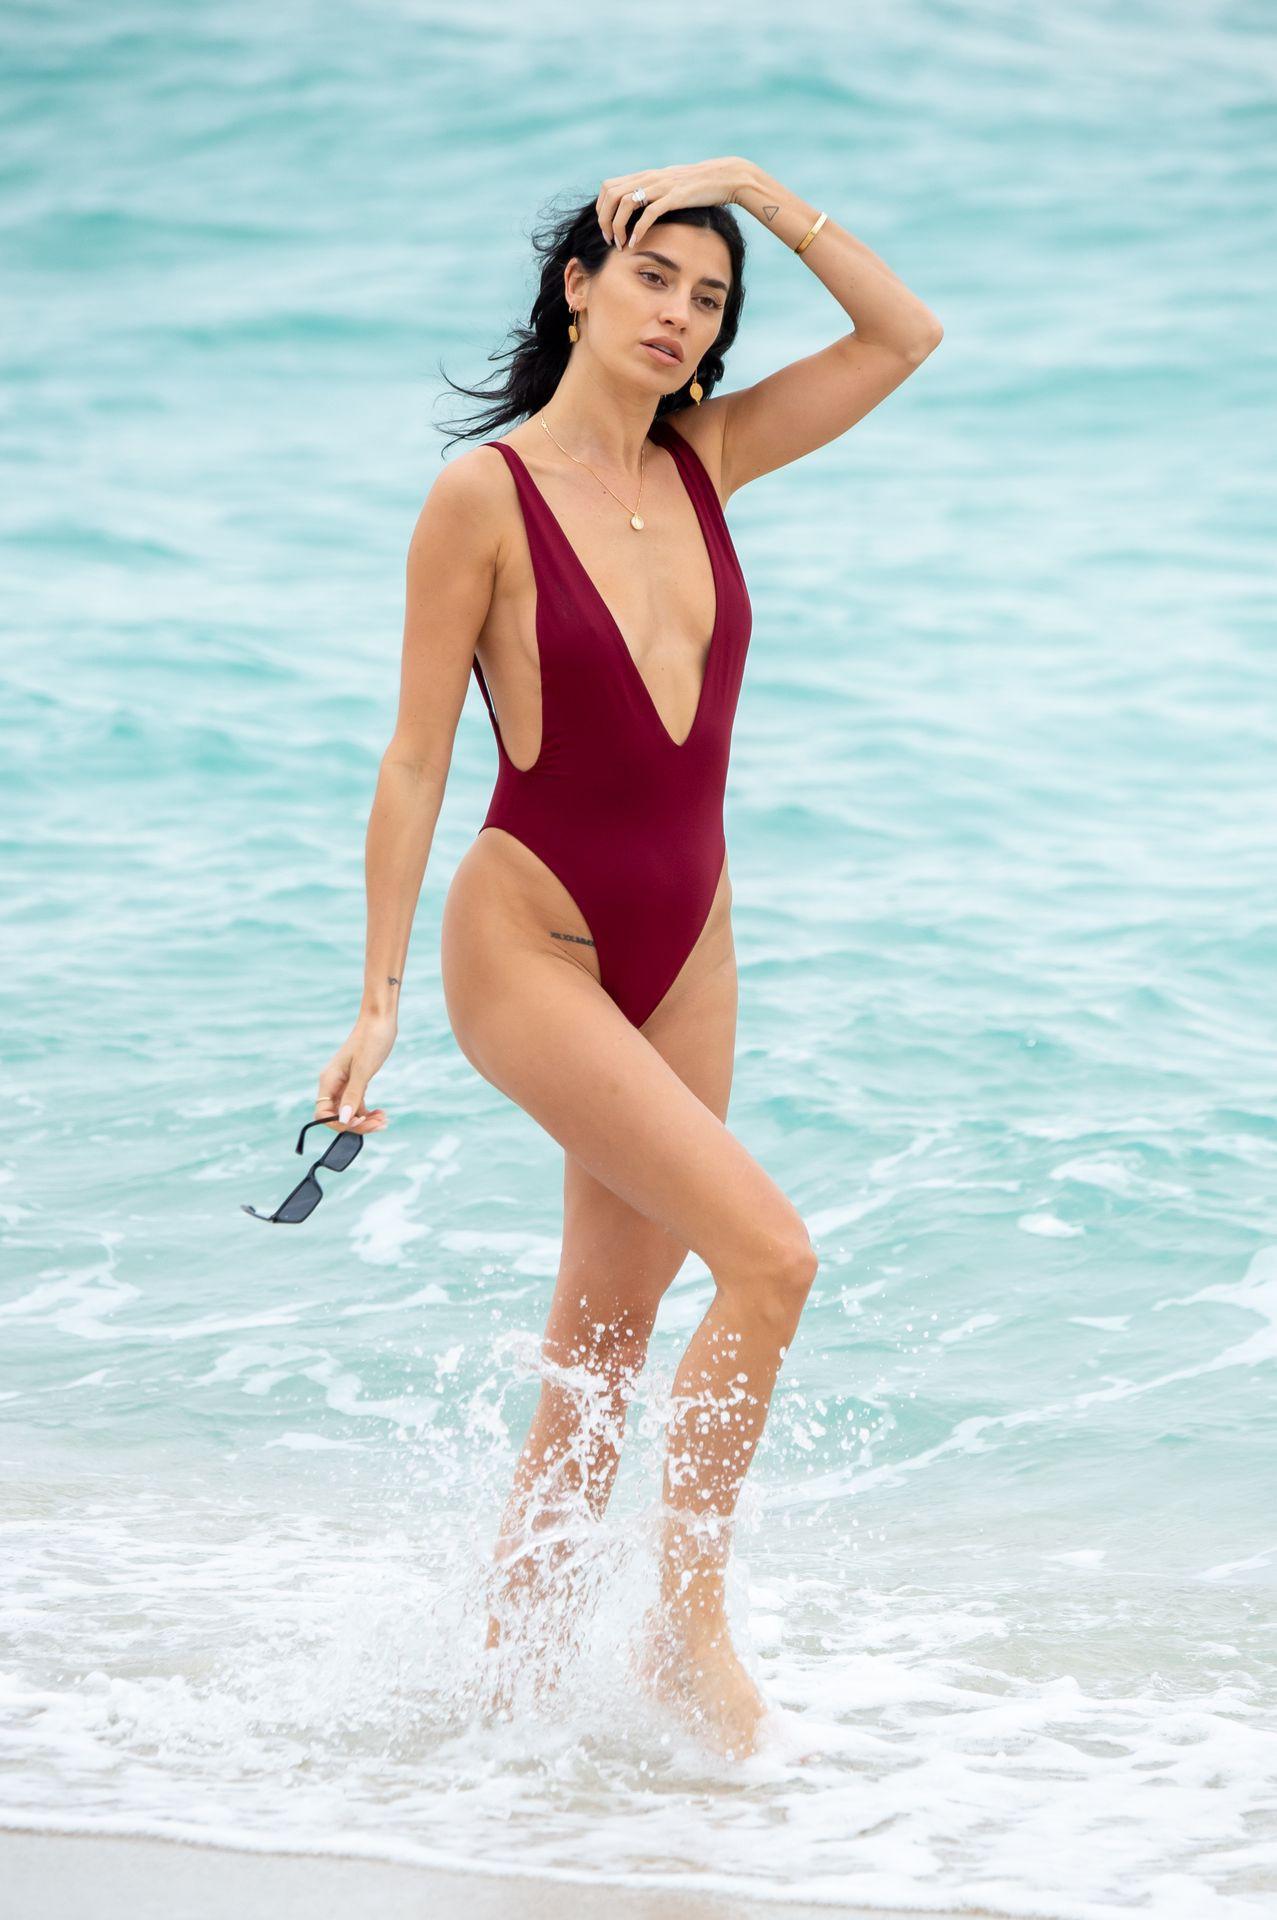 Nicoel Williams Sexy Low Cut Swimsuit